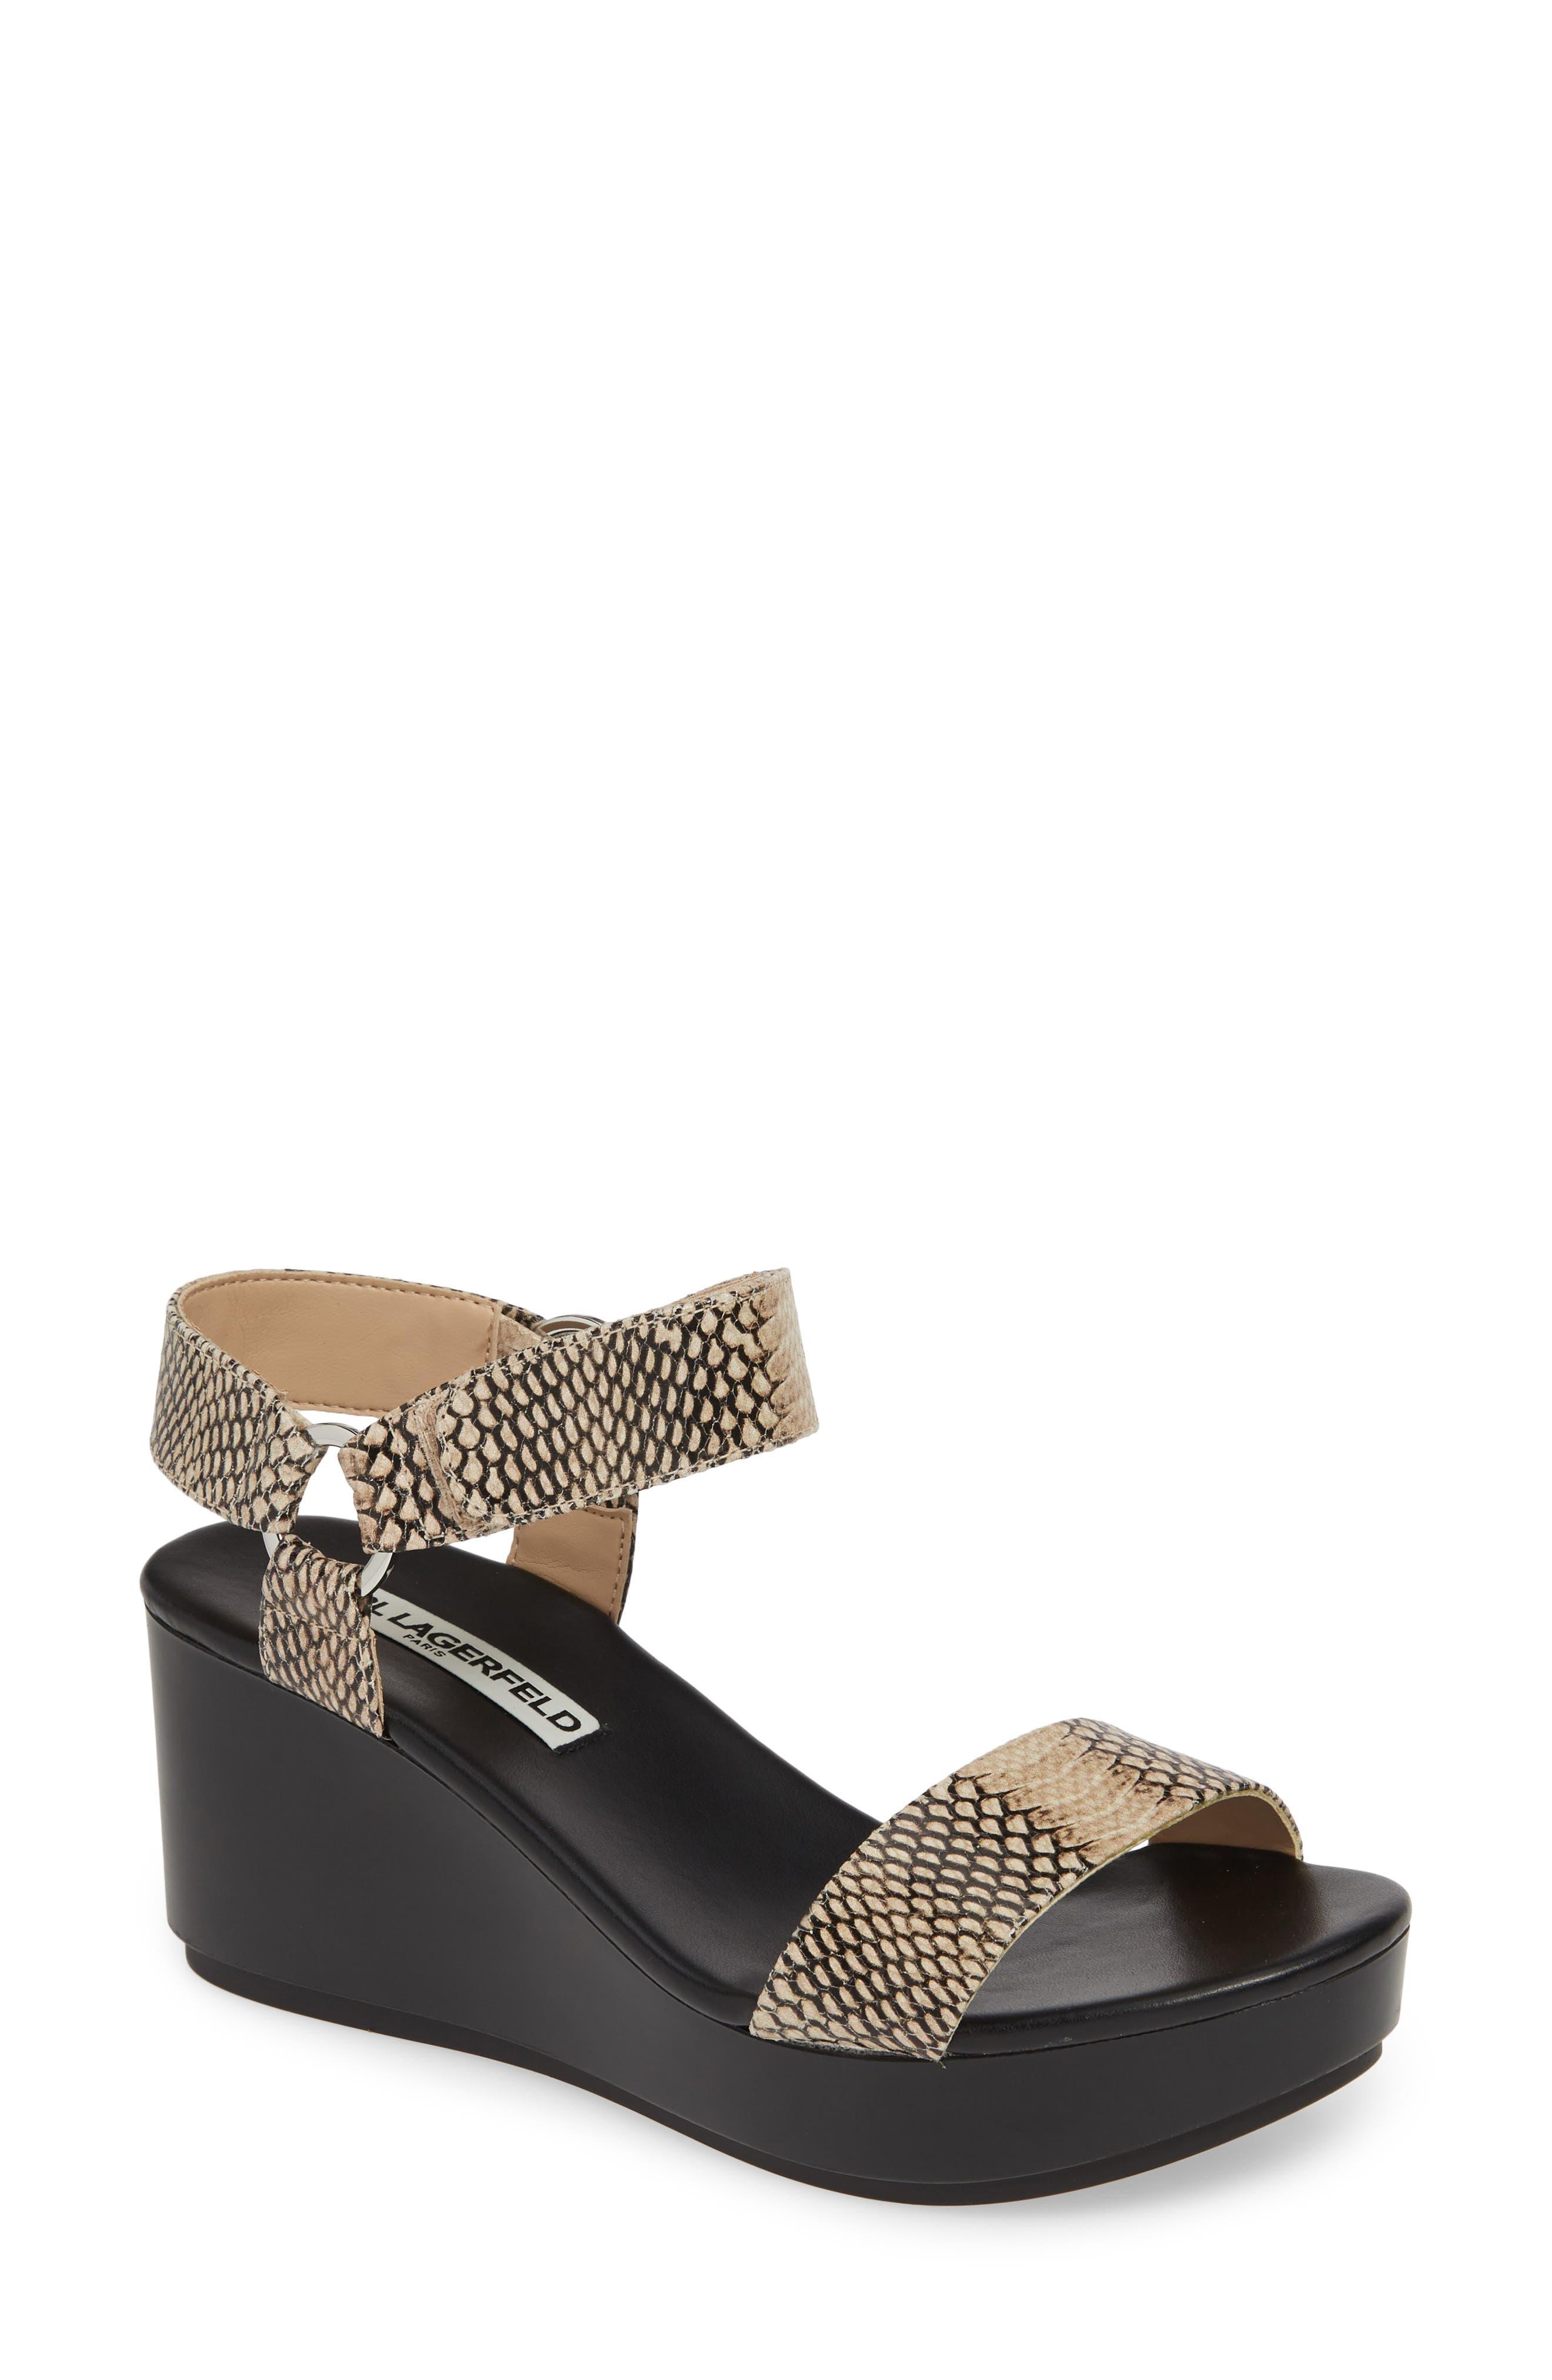 Karl Lagerfeld Paris Lana Platform Sandal- Black